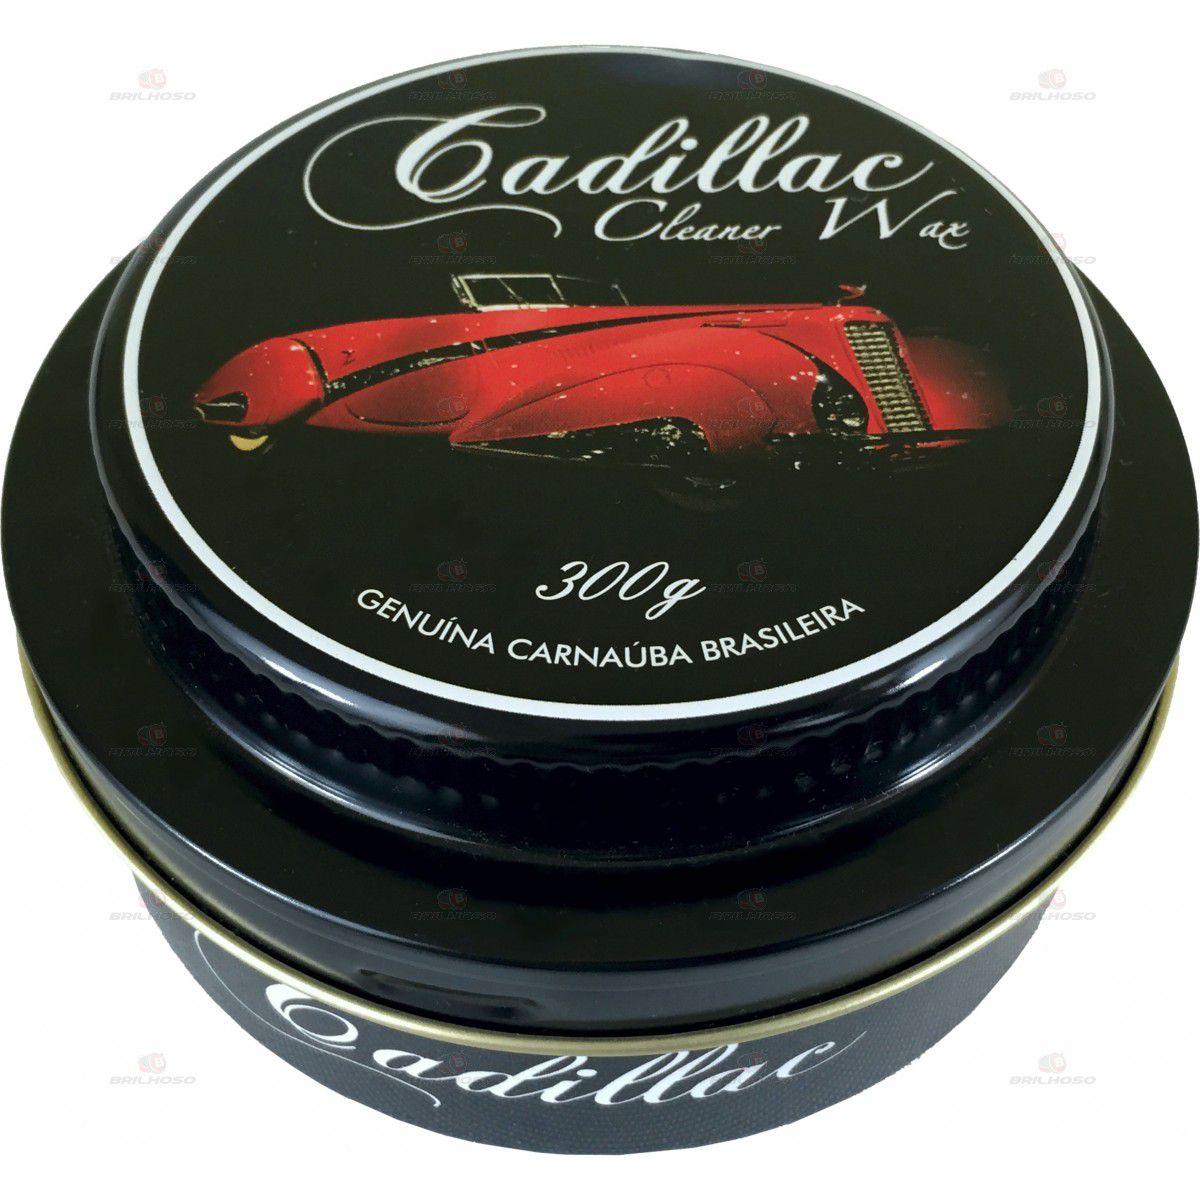 Cadillac Cera de Carnauba Cleaner Wax - 300g  - Loja Go Eco Wash